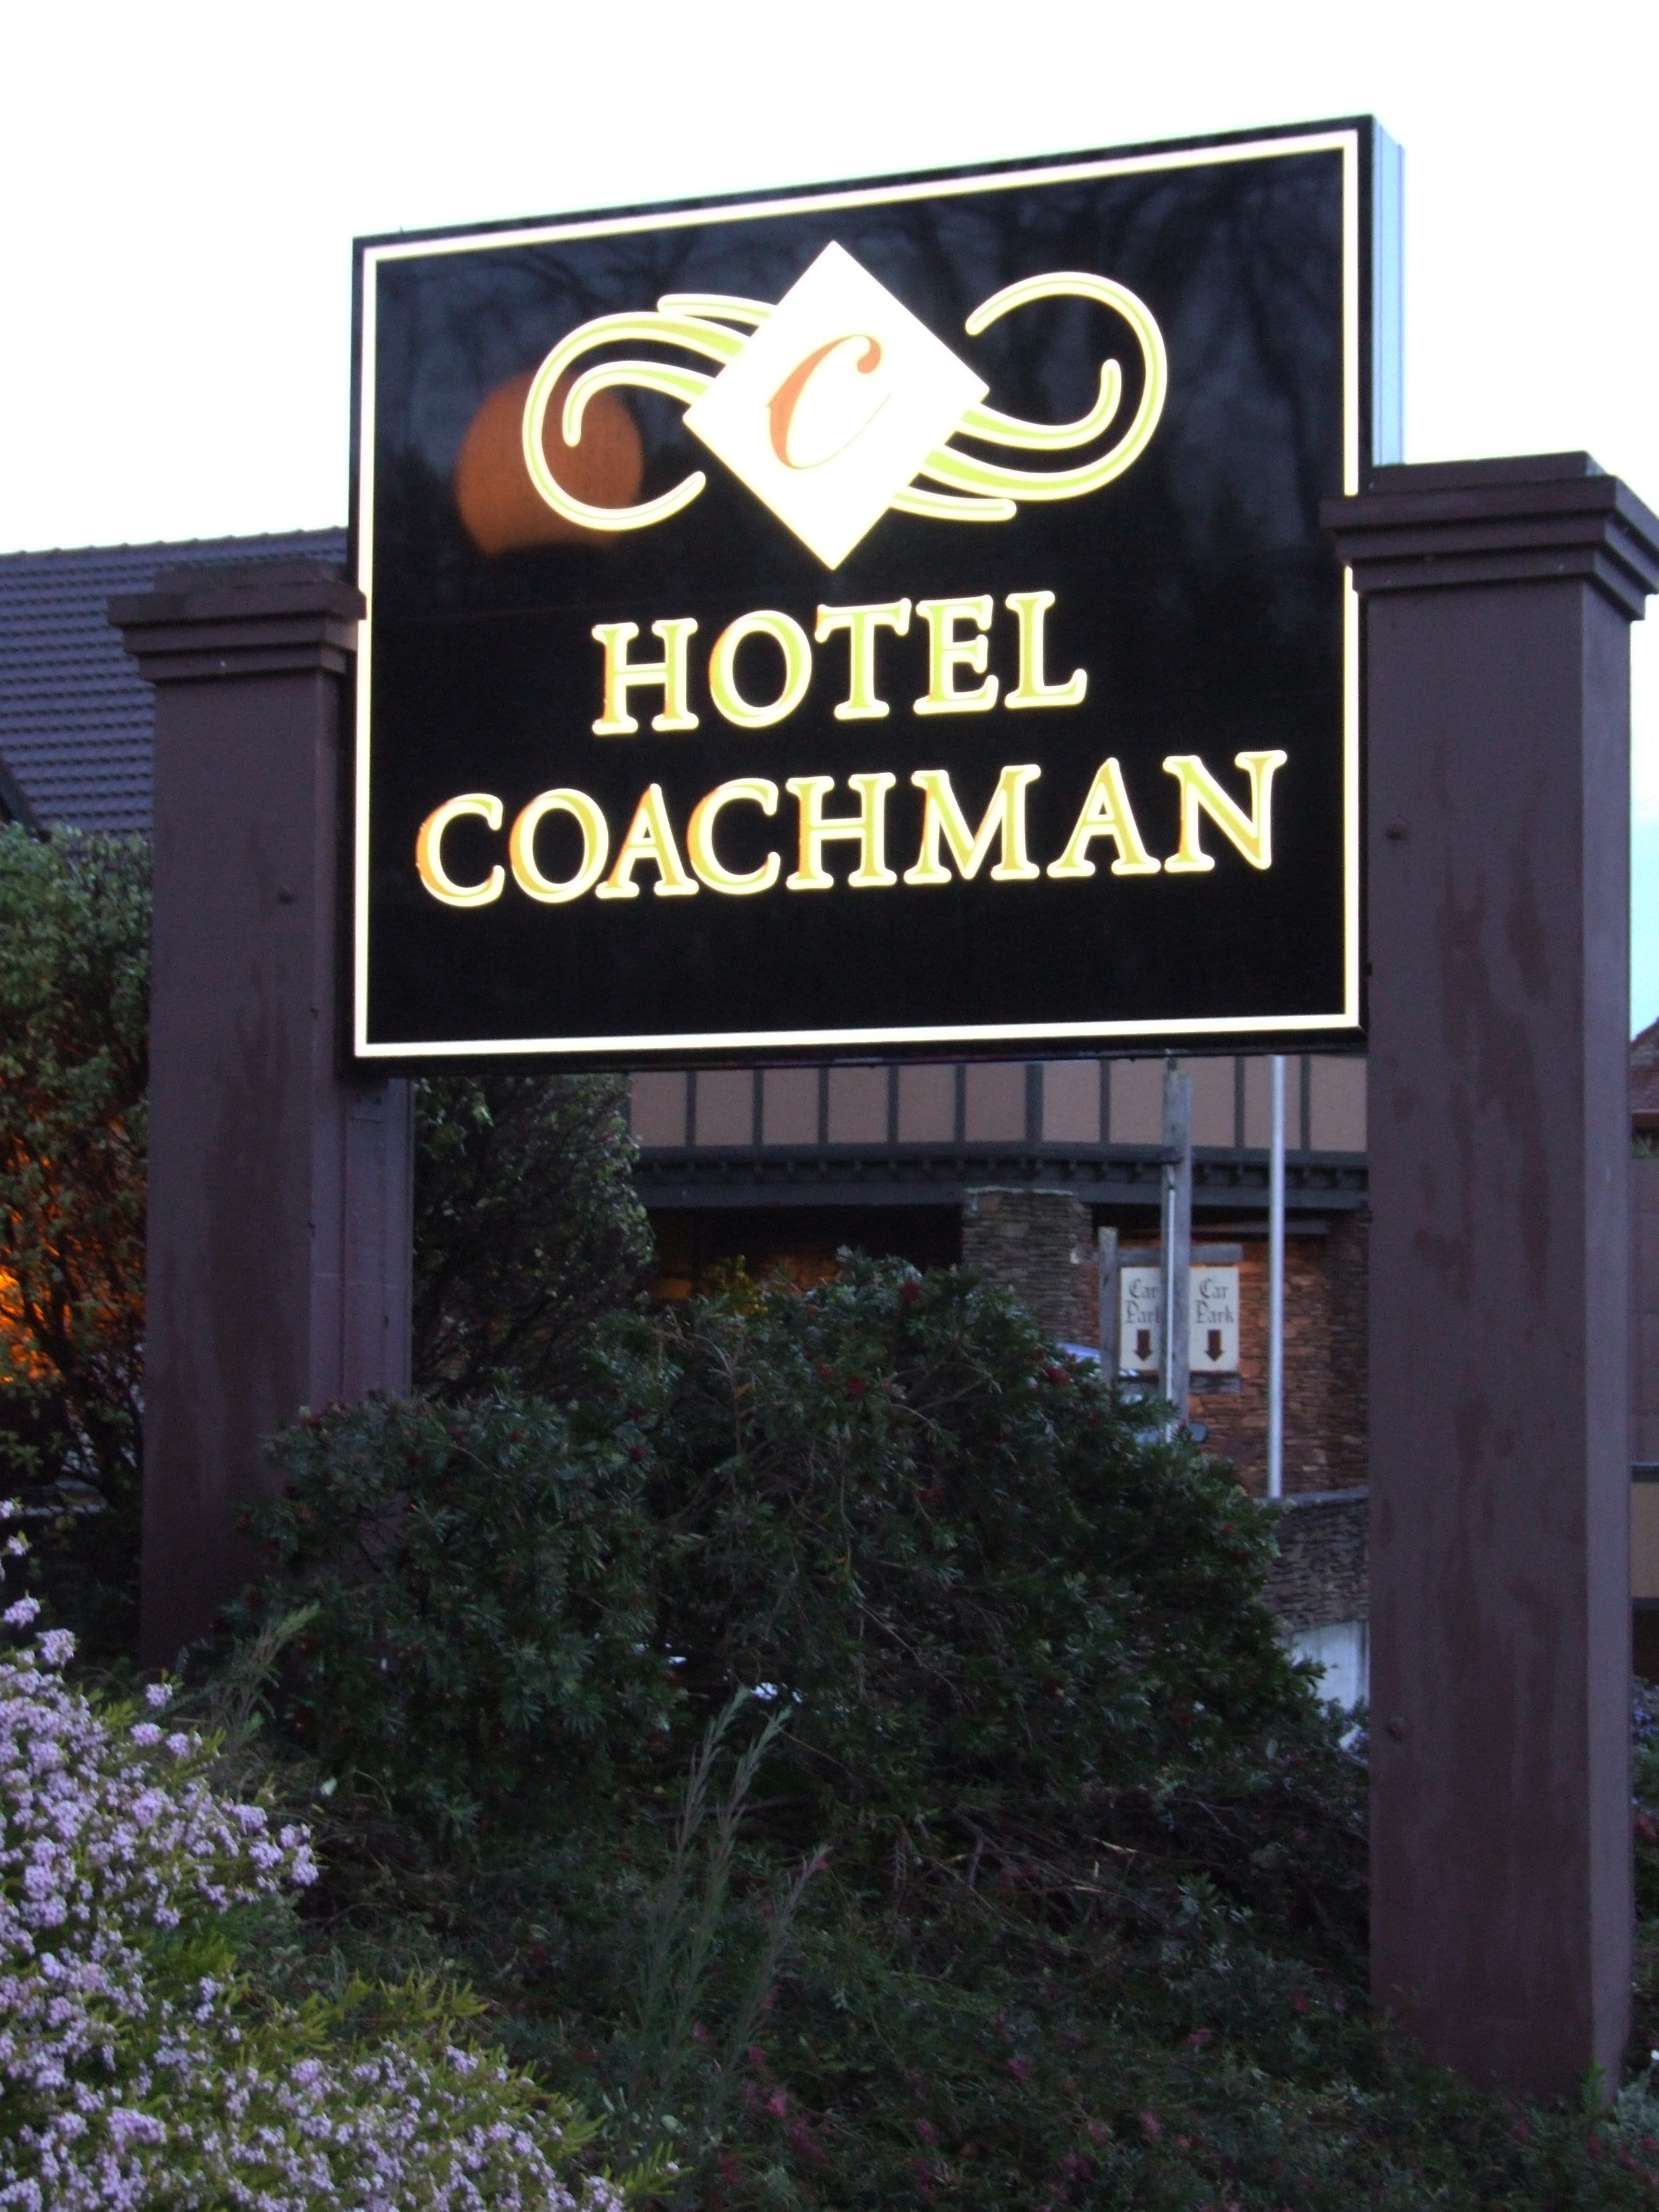 Hotel Coachman Exterior 9.jpg